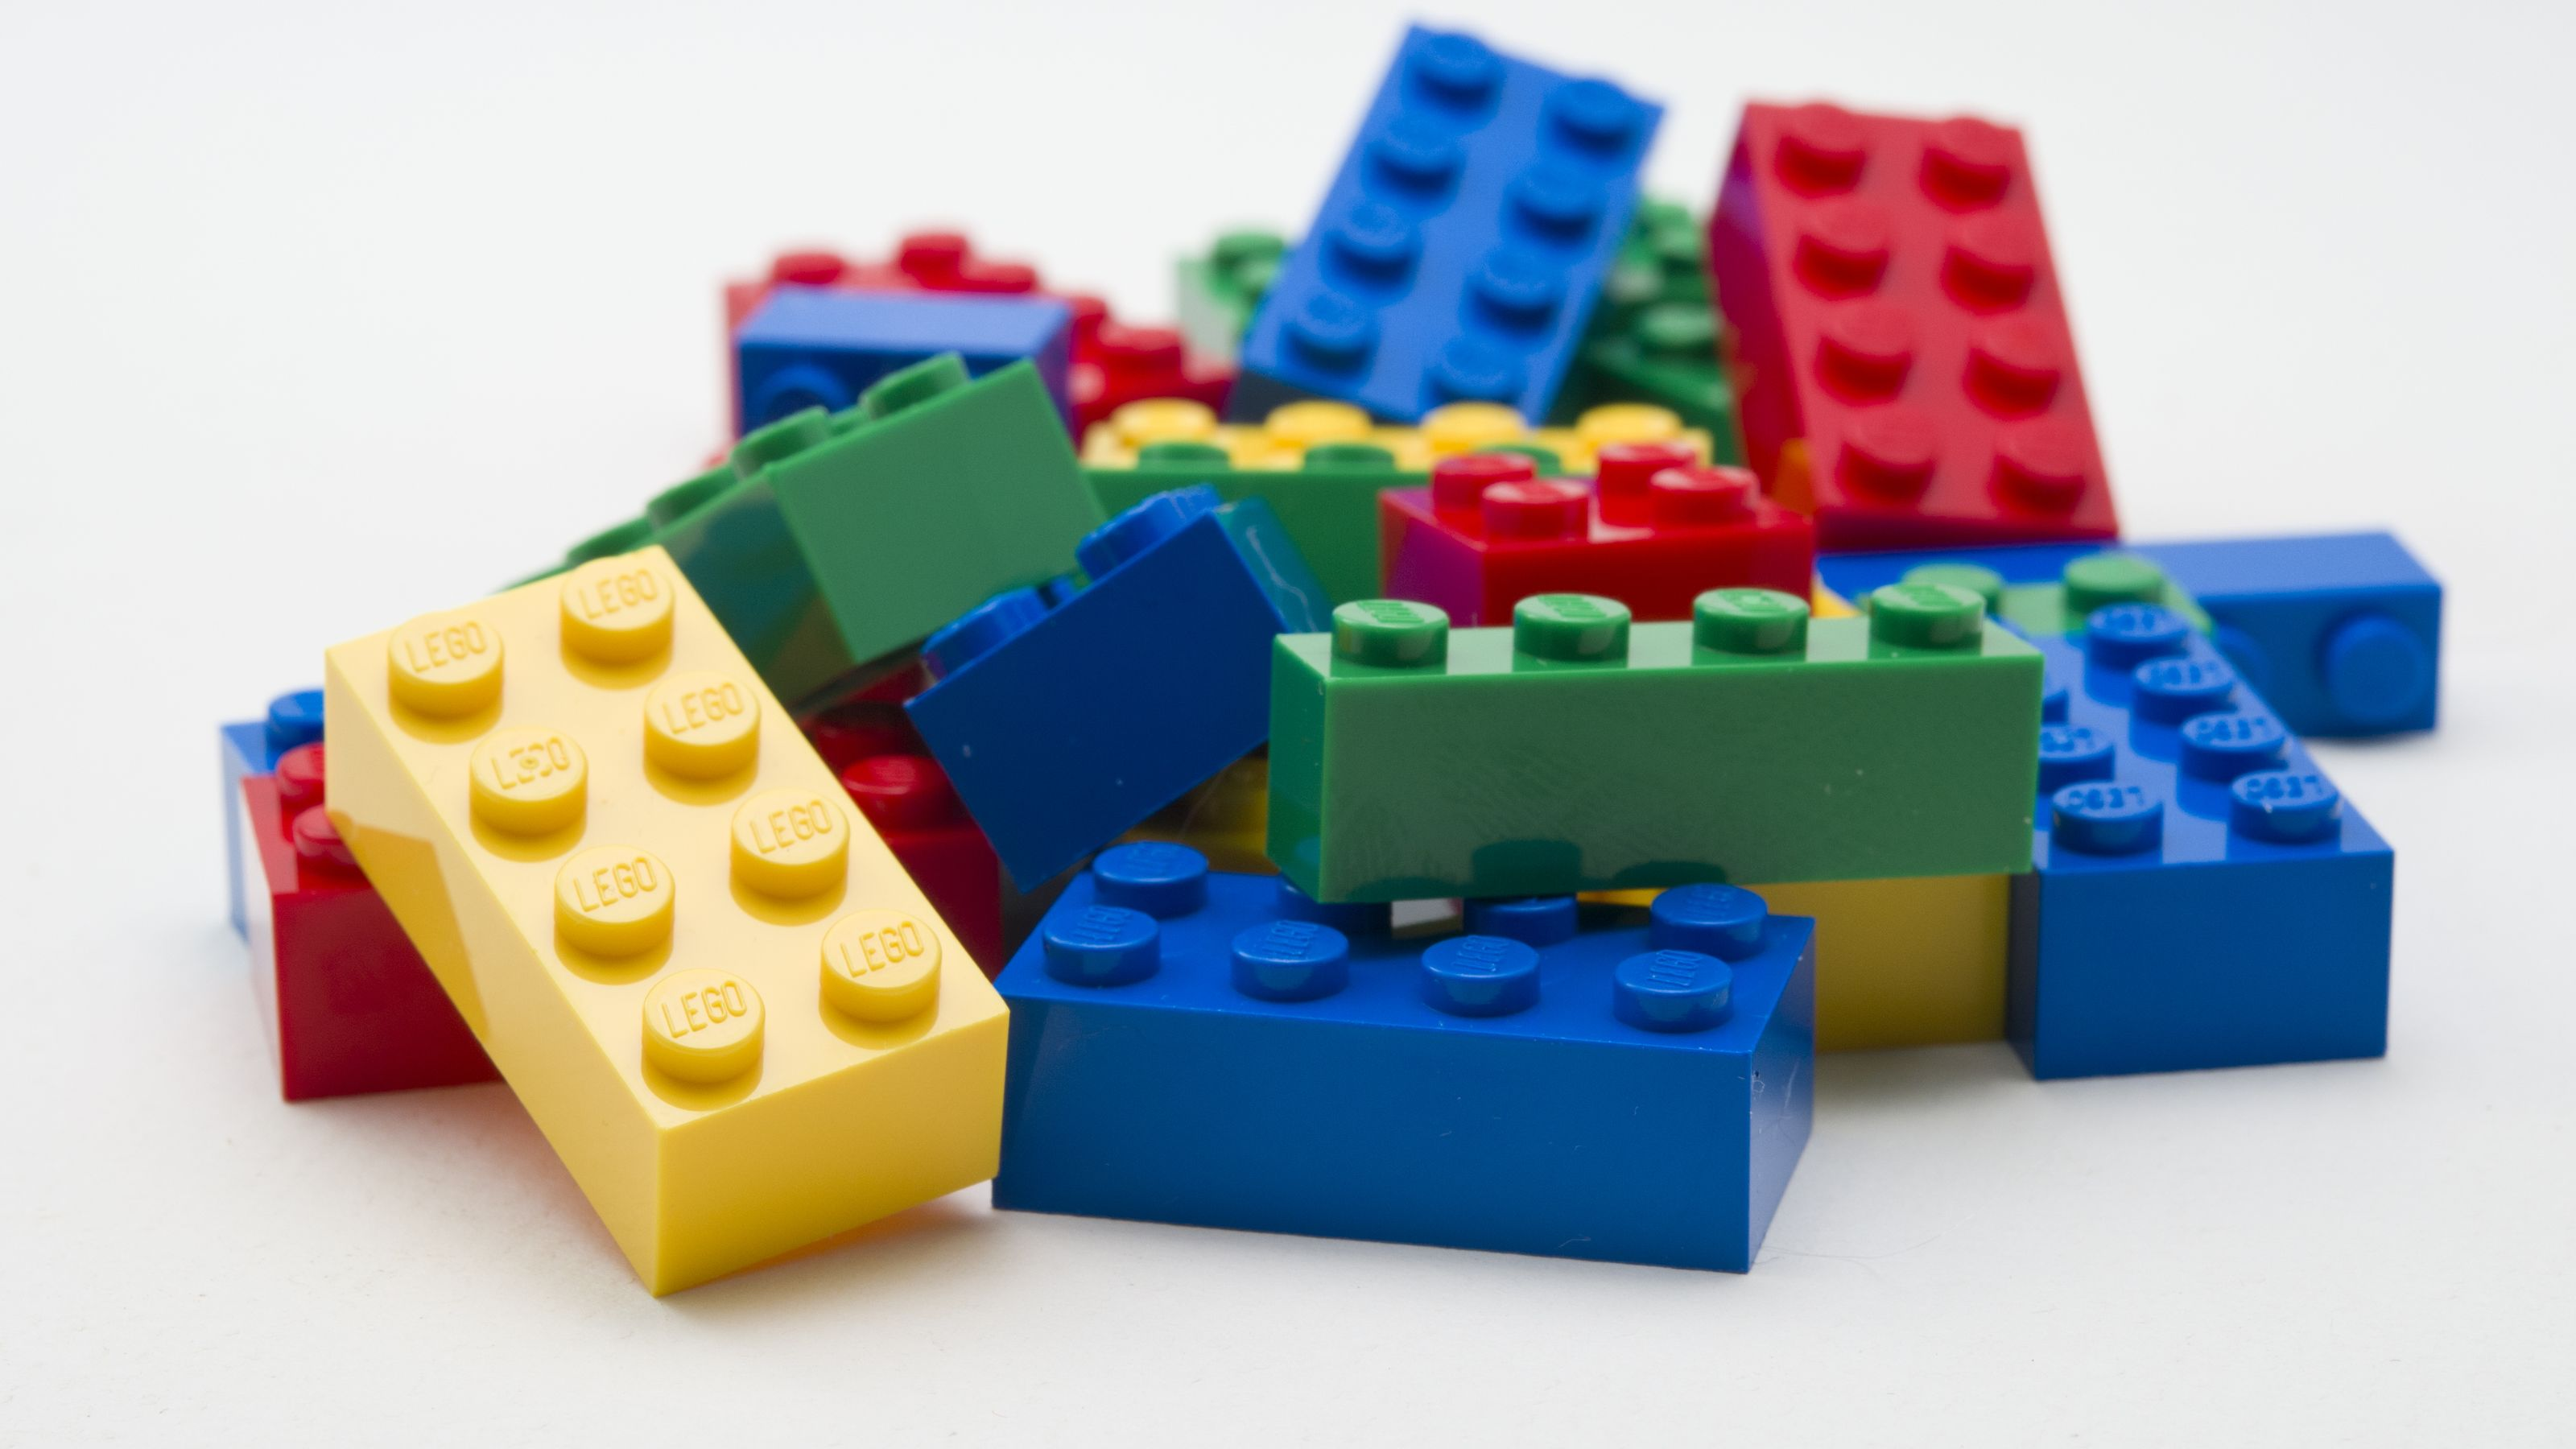 Lego Robot vs cubo di Rubik